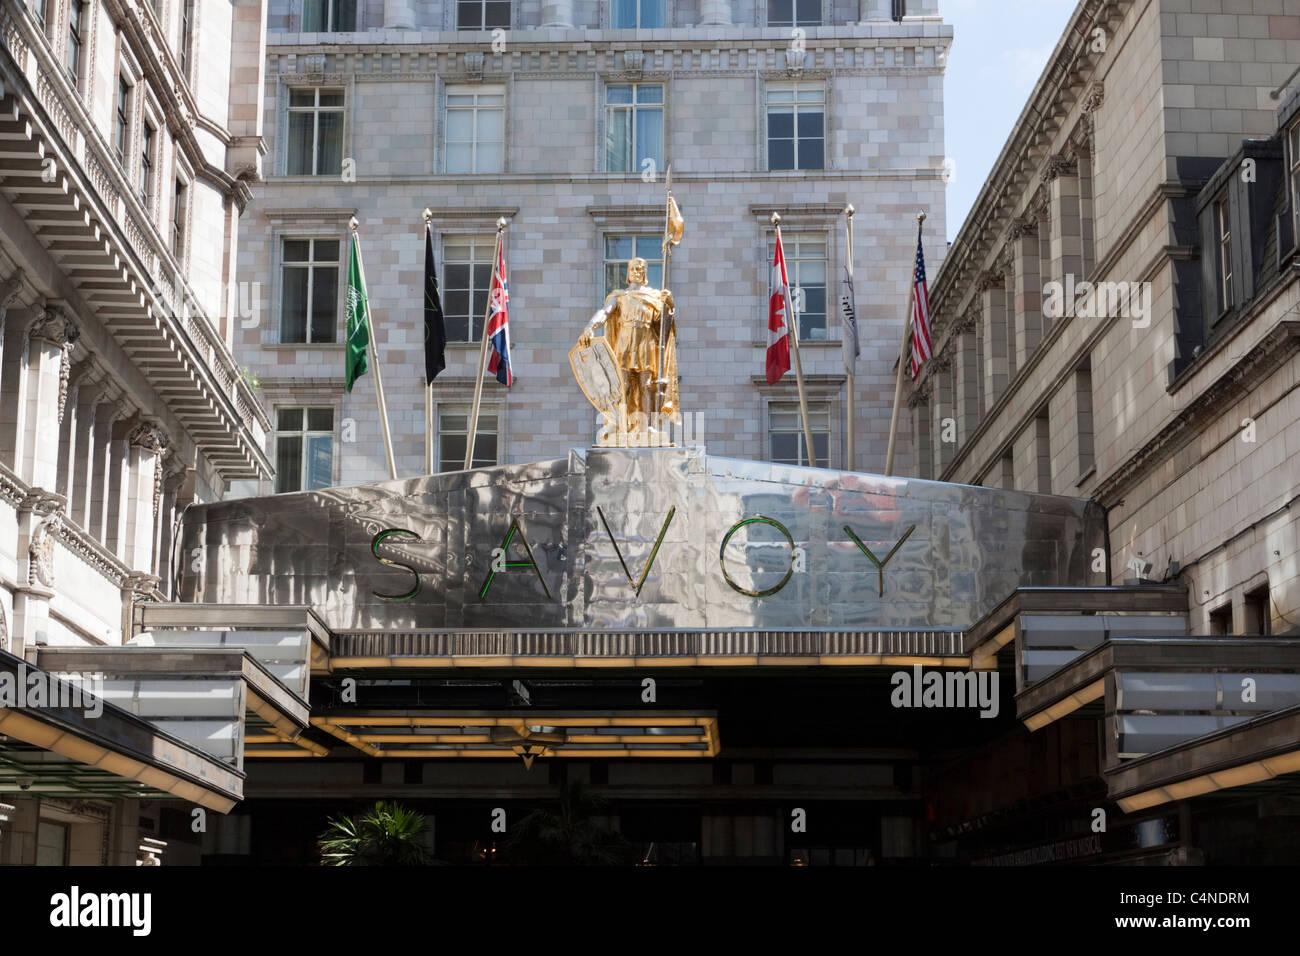 The Savoy hotel, the Strand, London, England - Stock Image